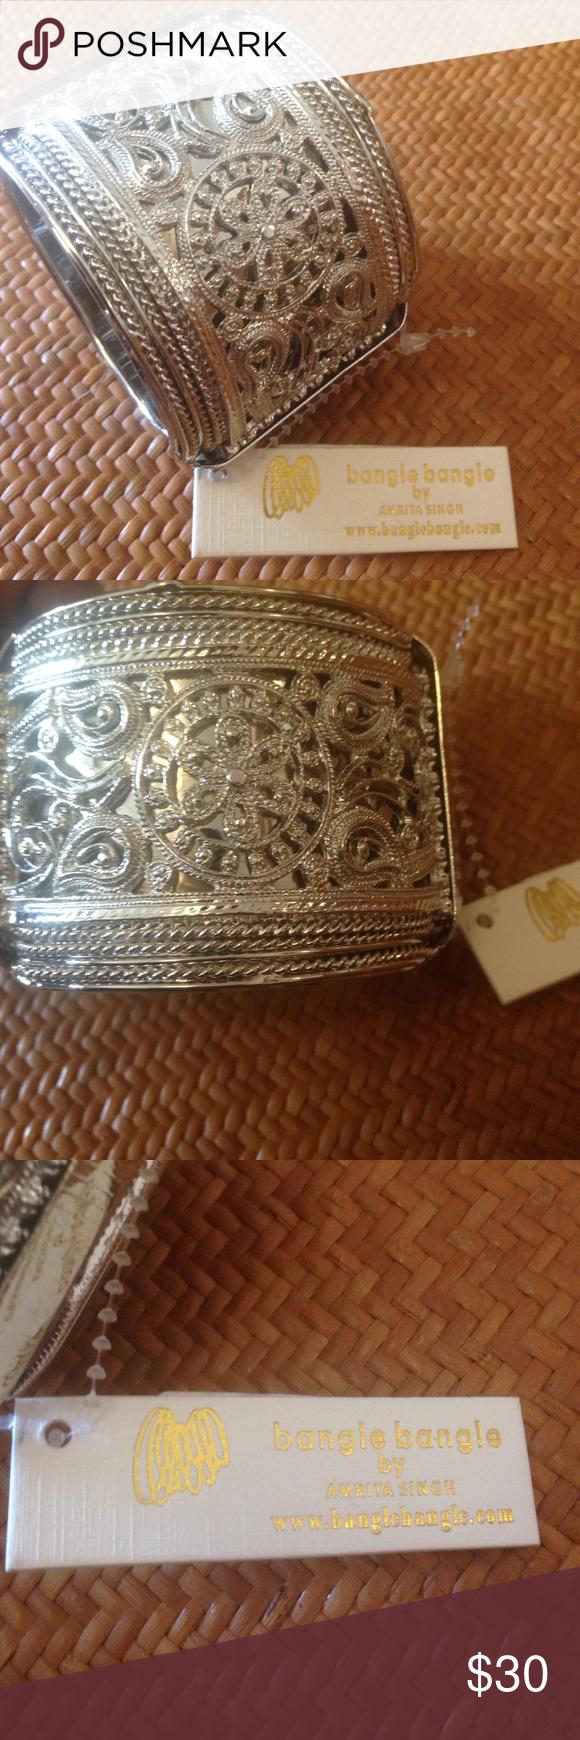 "Amrita Singh NWT silver paisleyprint cuff bracelet Silver tone bangle bangle by Amrita Singh NWT aprox 9.5"" around. Paisley print New With tags Amrita Singh Jewelry Bracelets"